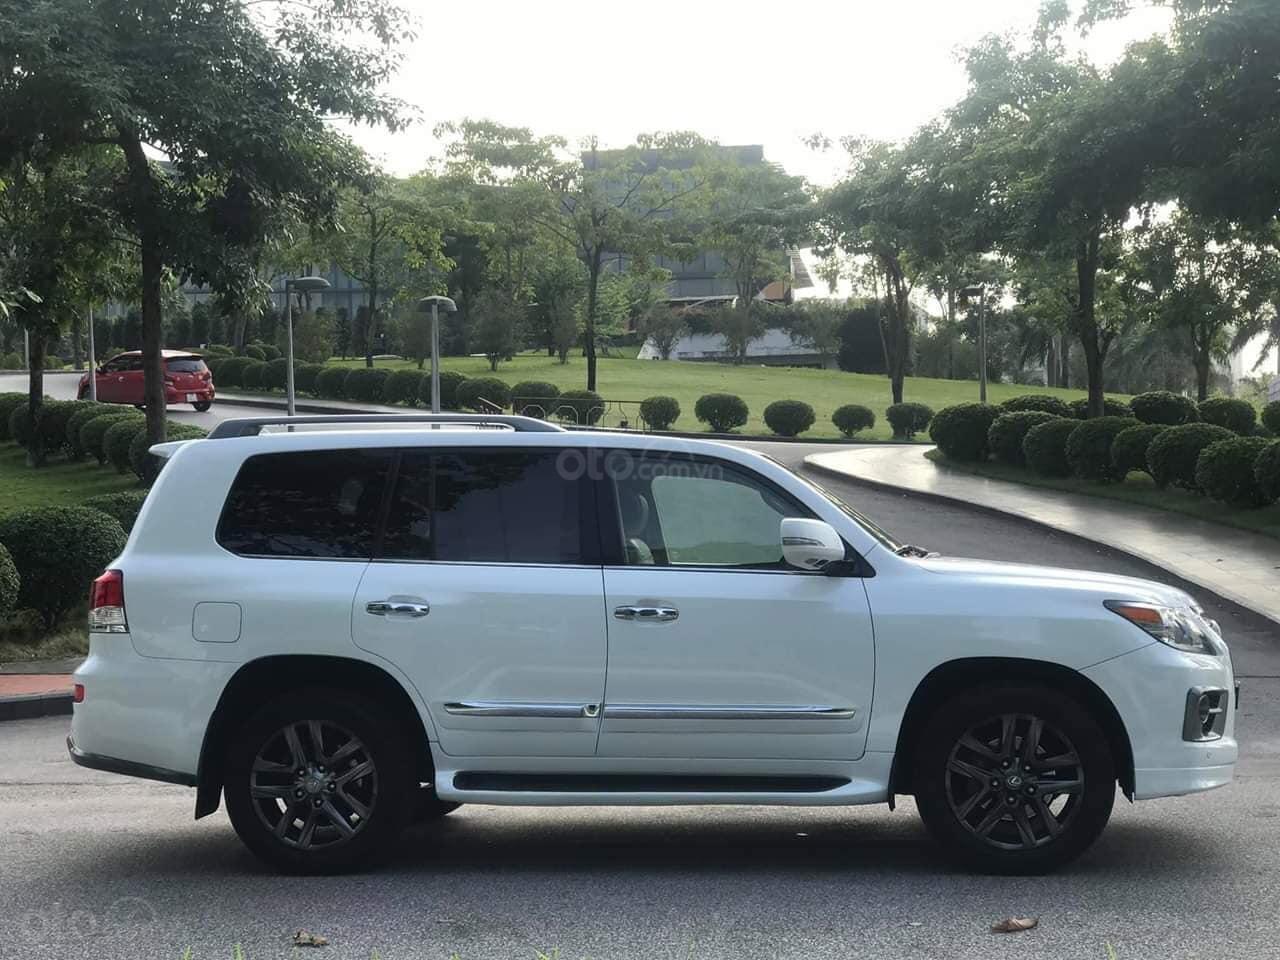 Giao ngay giao ngay Lexus LX570 trắng kem 2010 nhập Mỹ uy tín giá tốt (14)